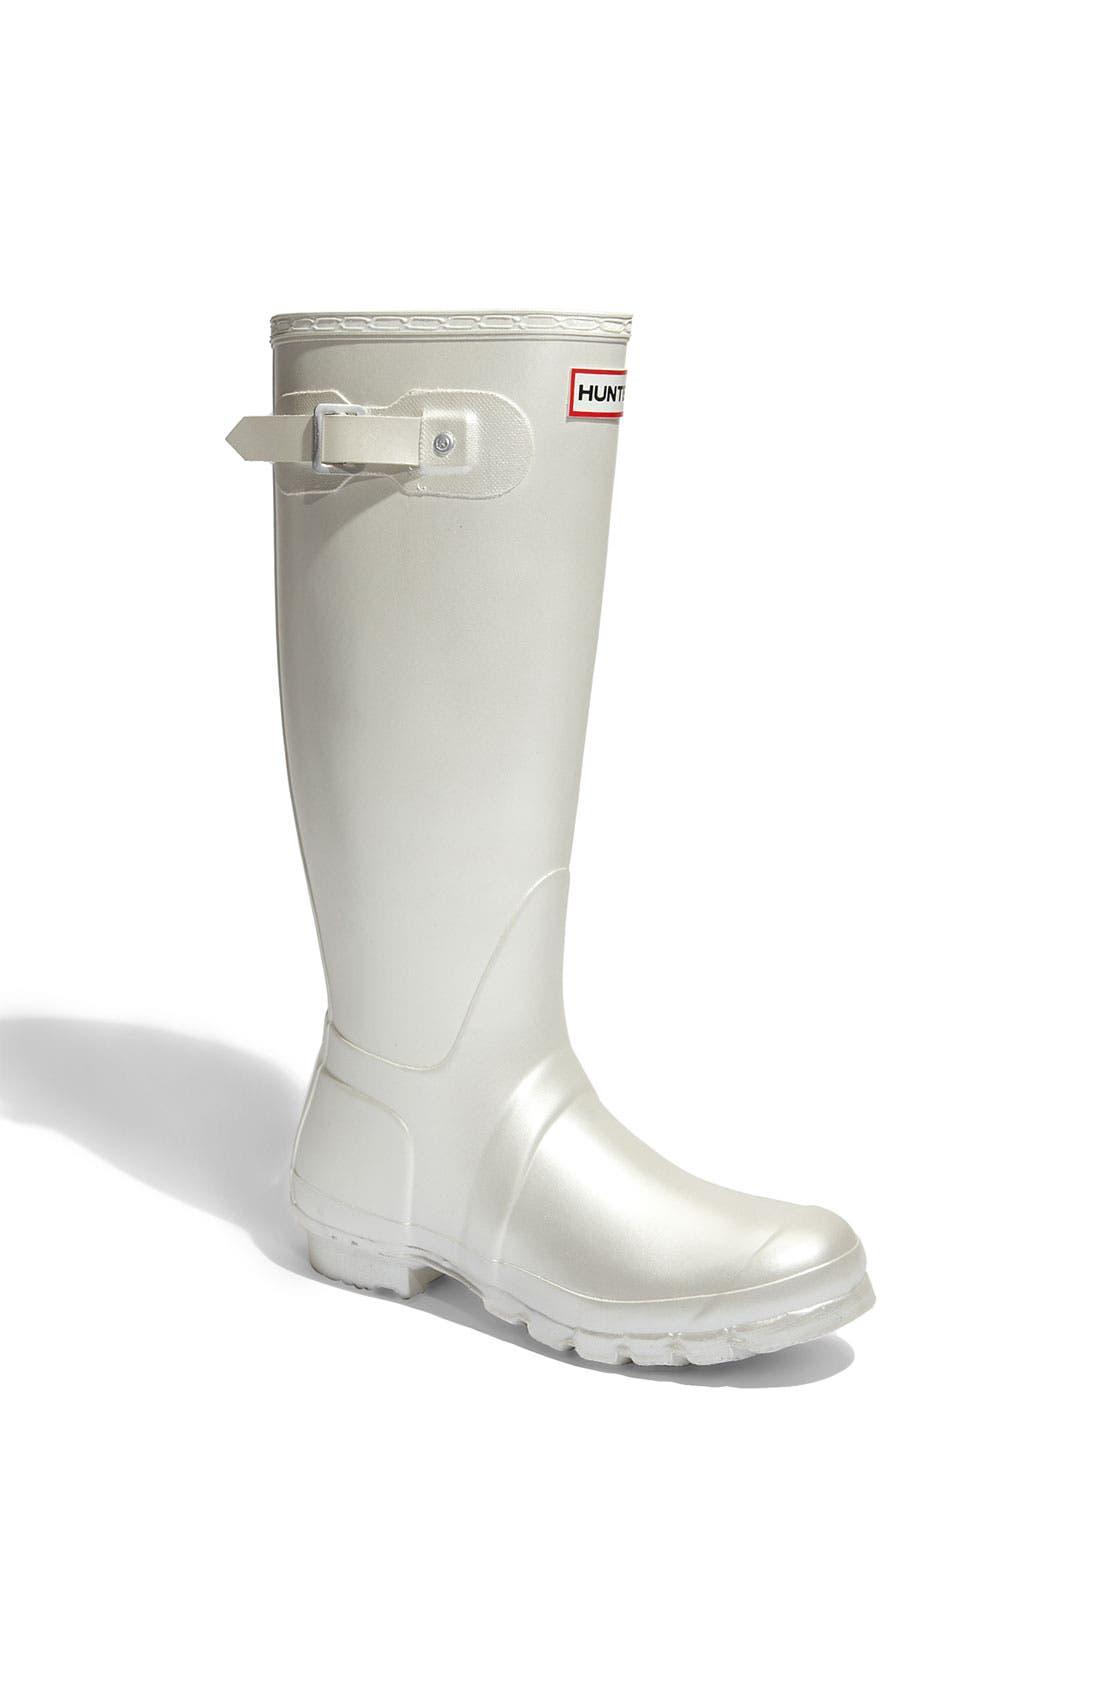 Alternate Image 1 Selected - Hunter 'Original Tall' Metallic Rain Boot (Women)